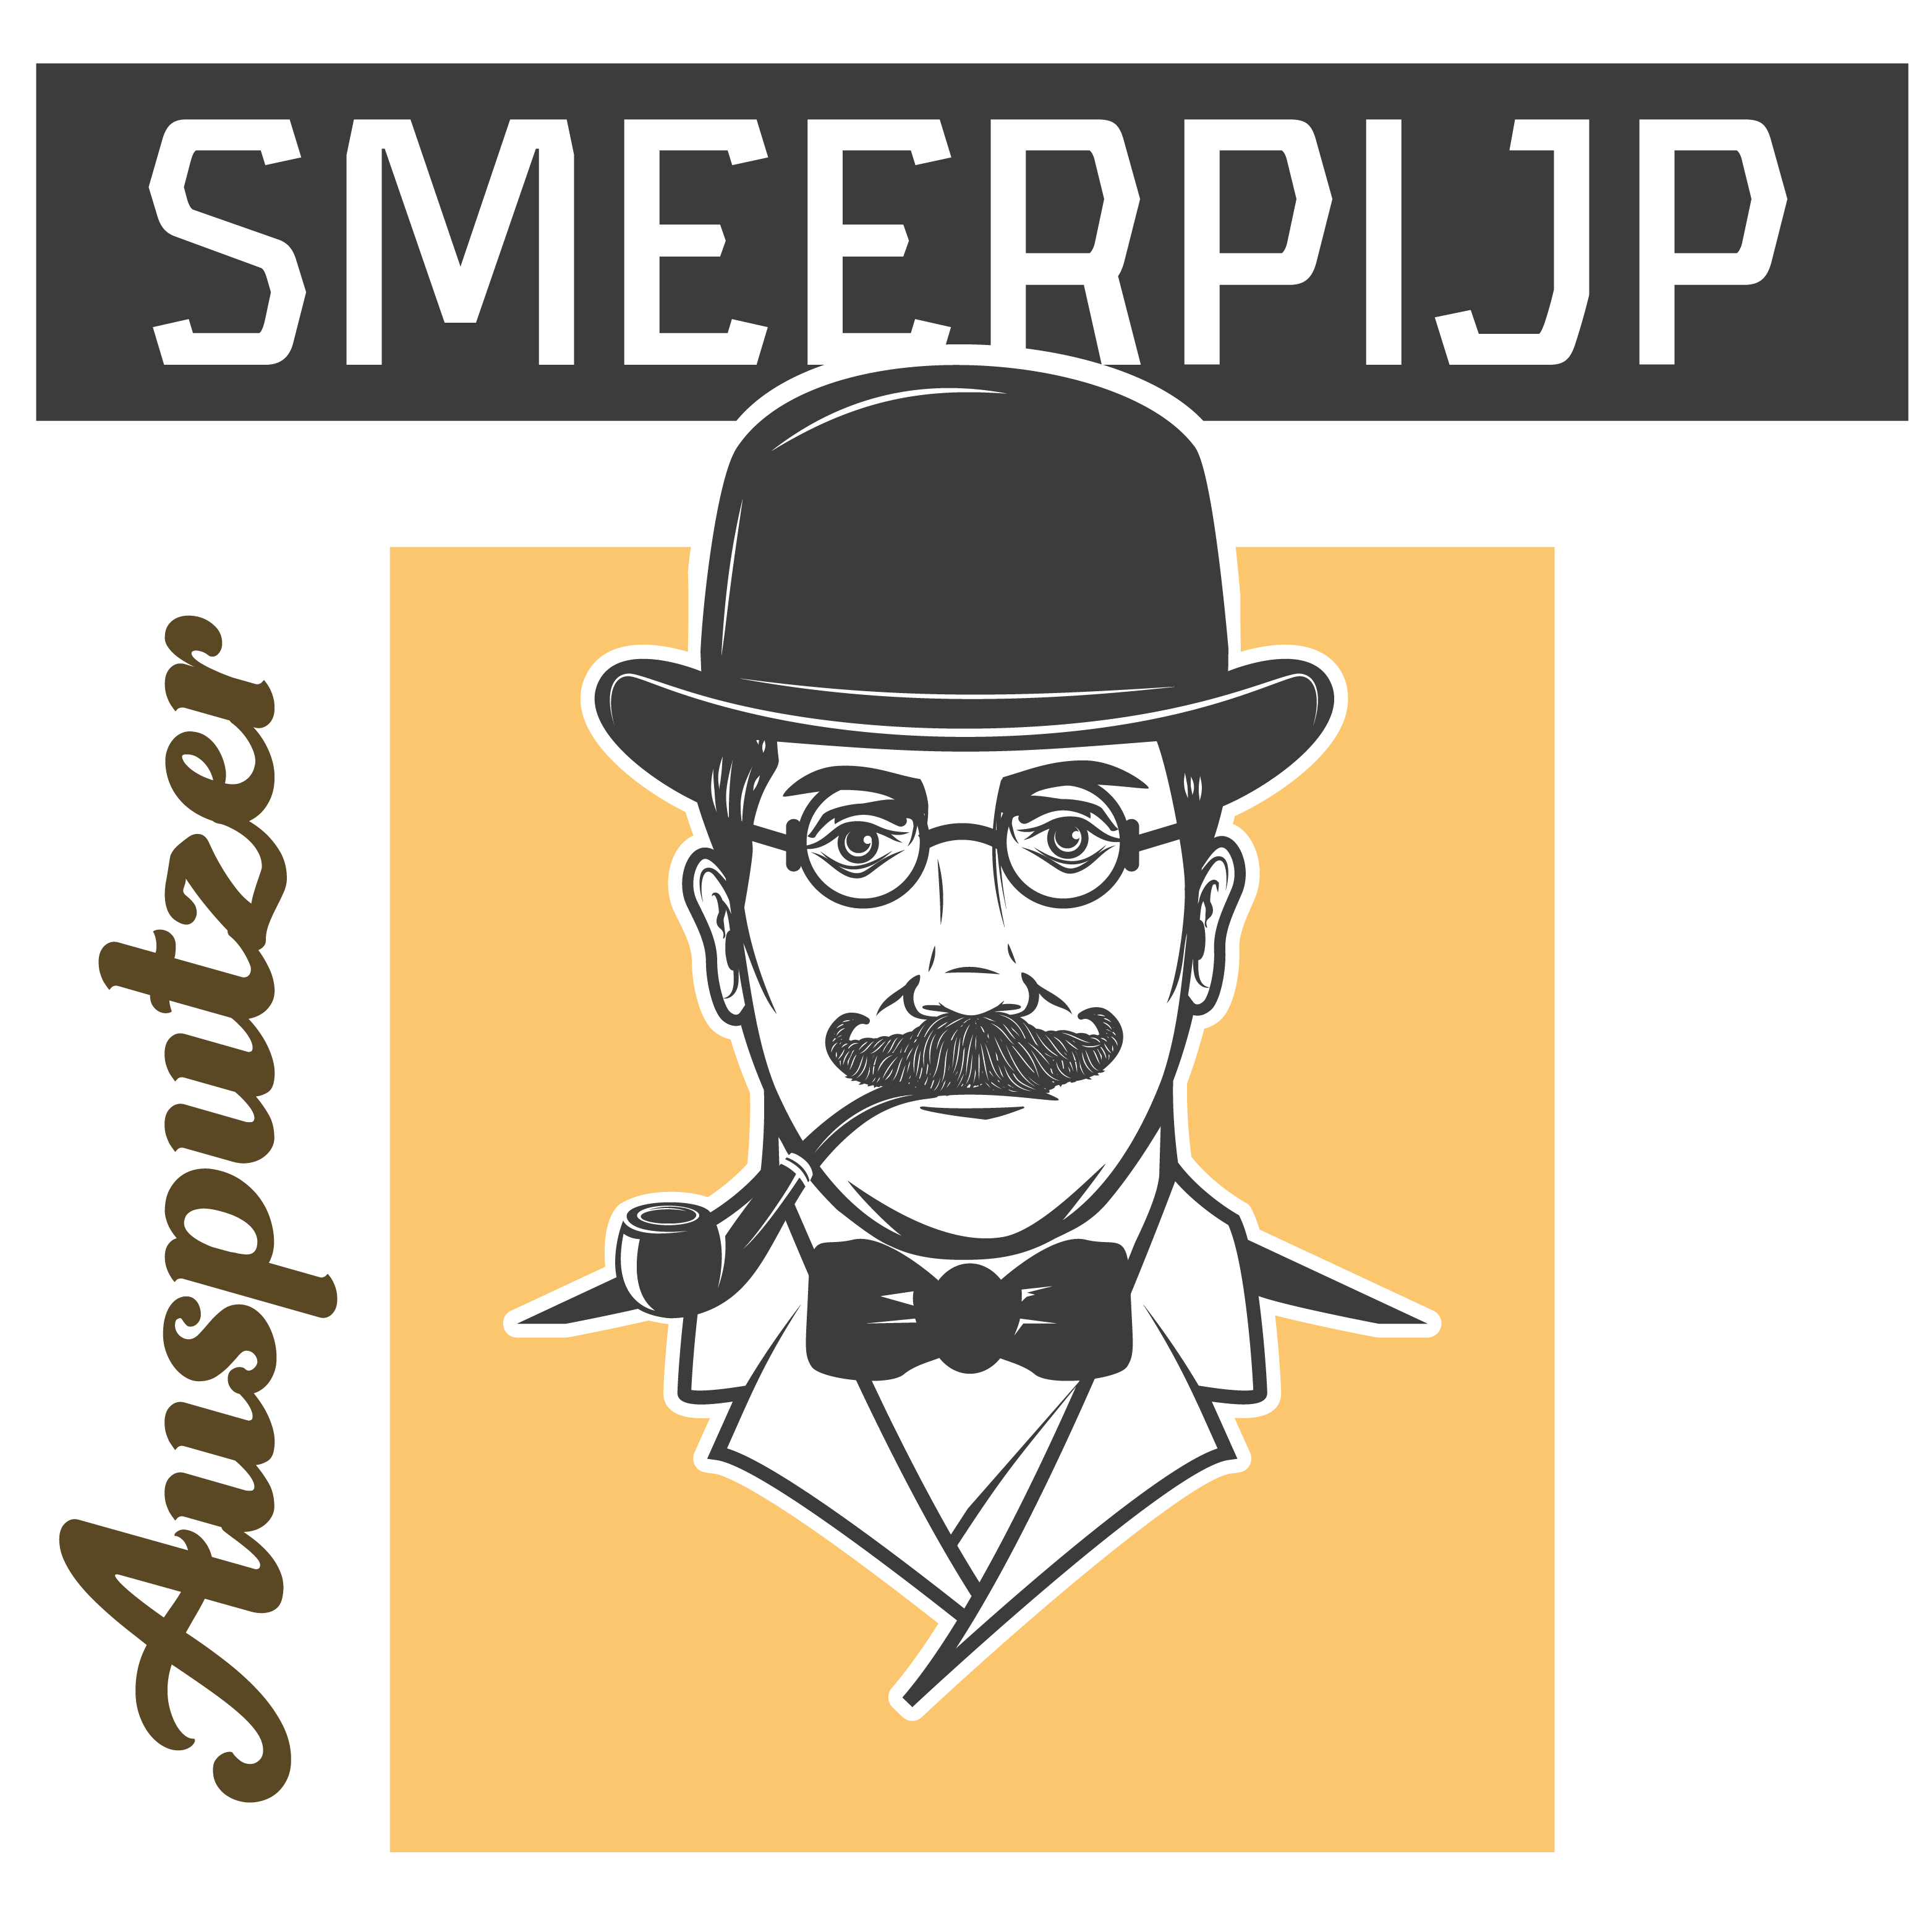 logo-smeerpijp-vierkant_Ausputzer